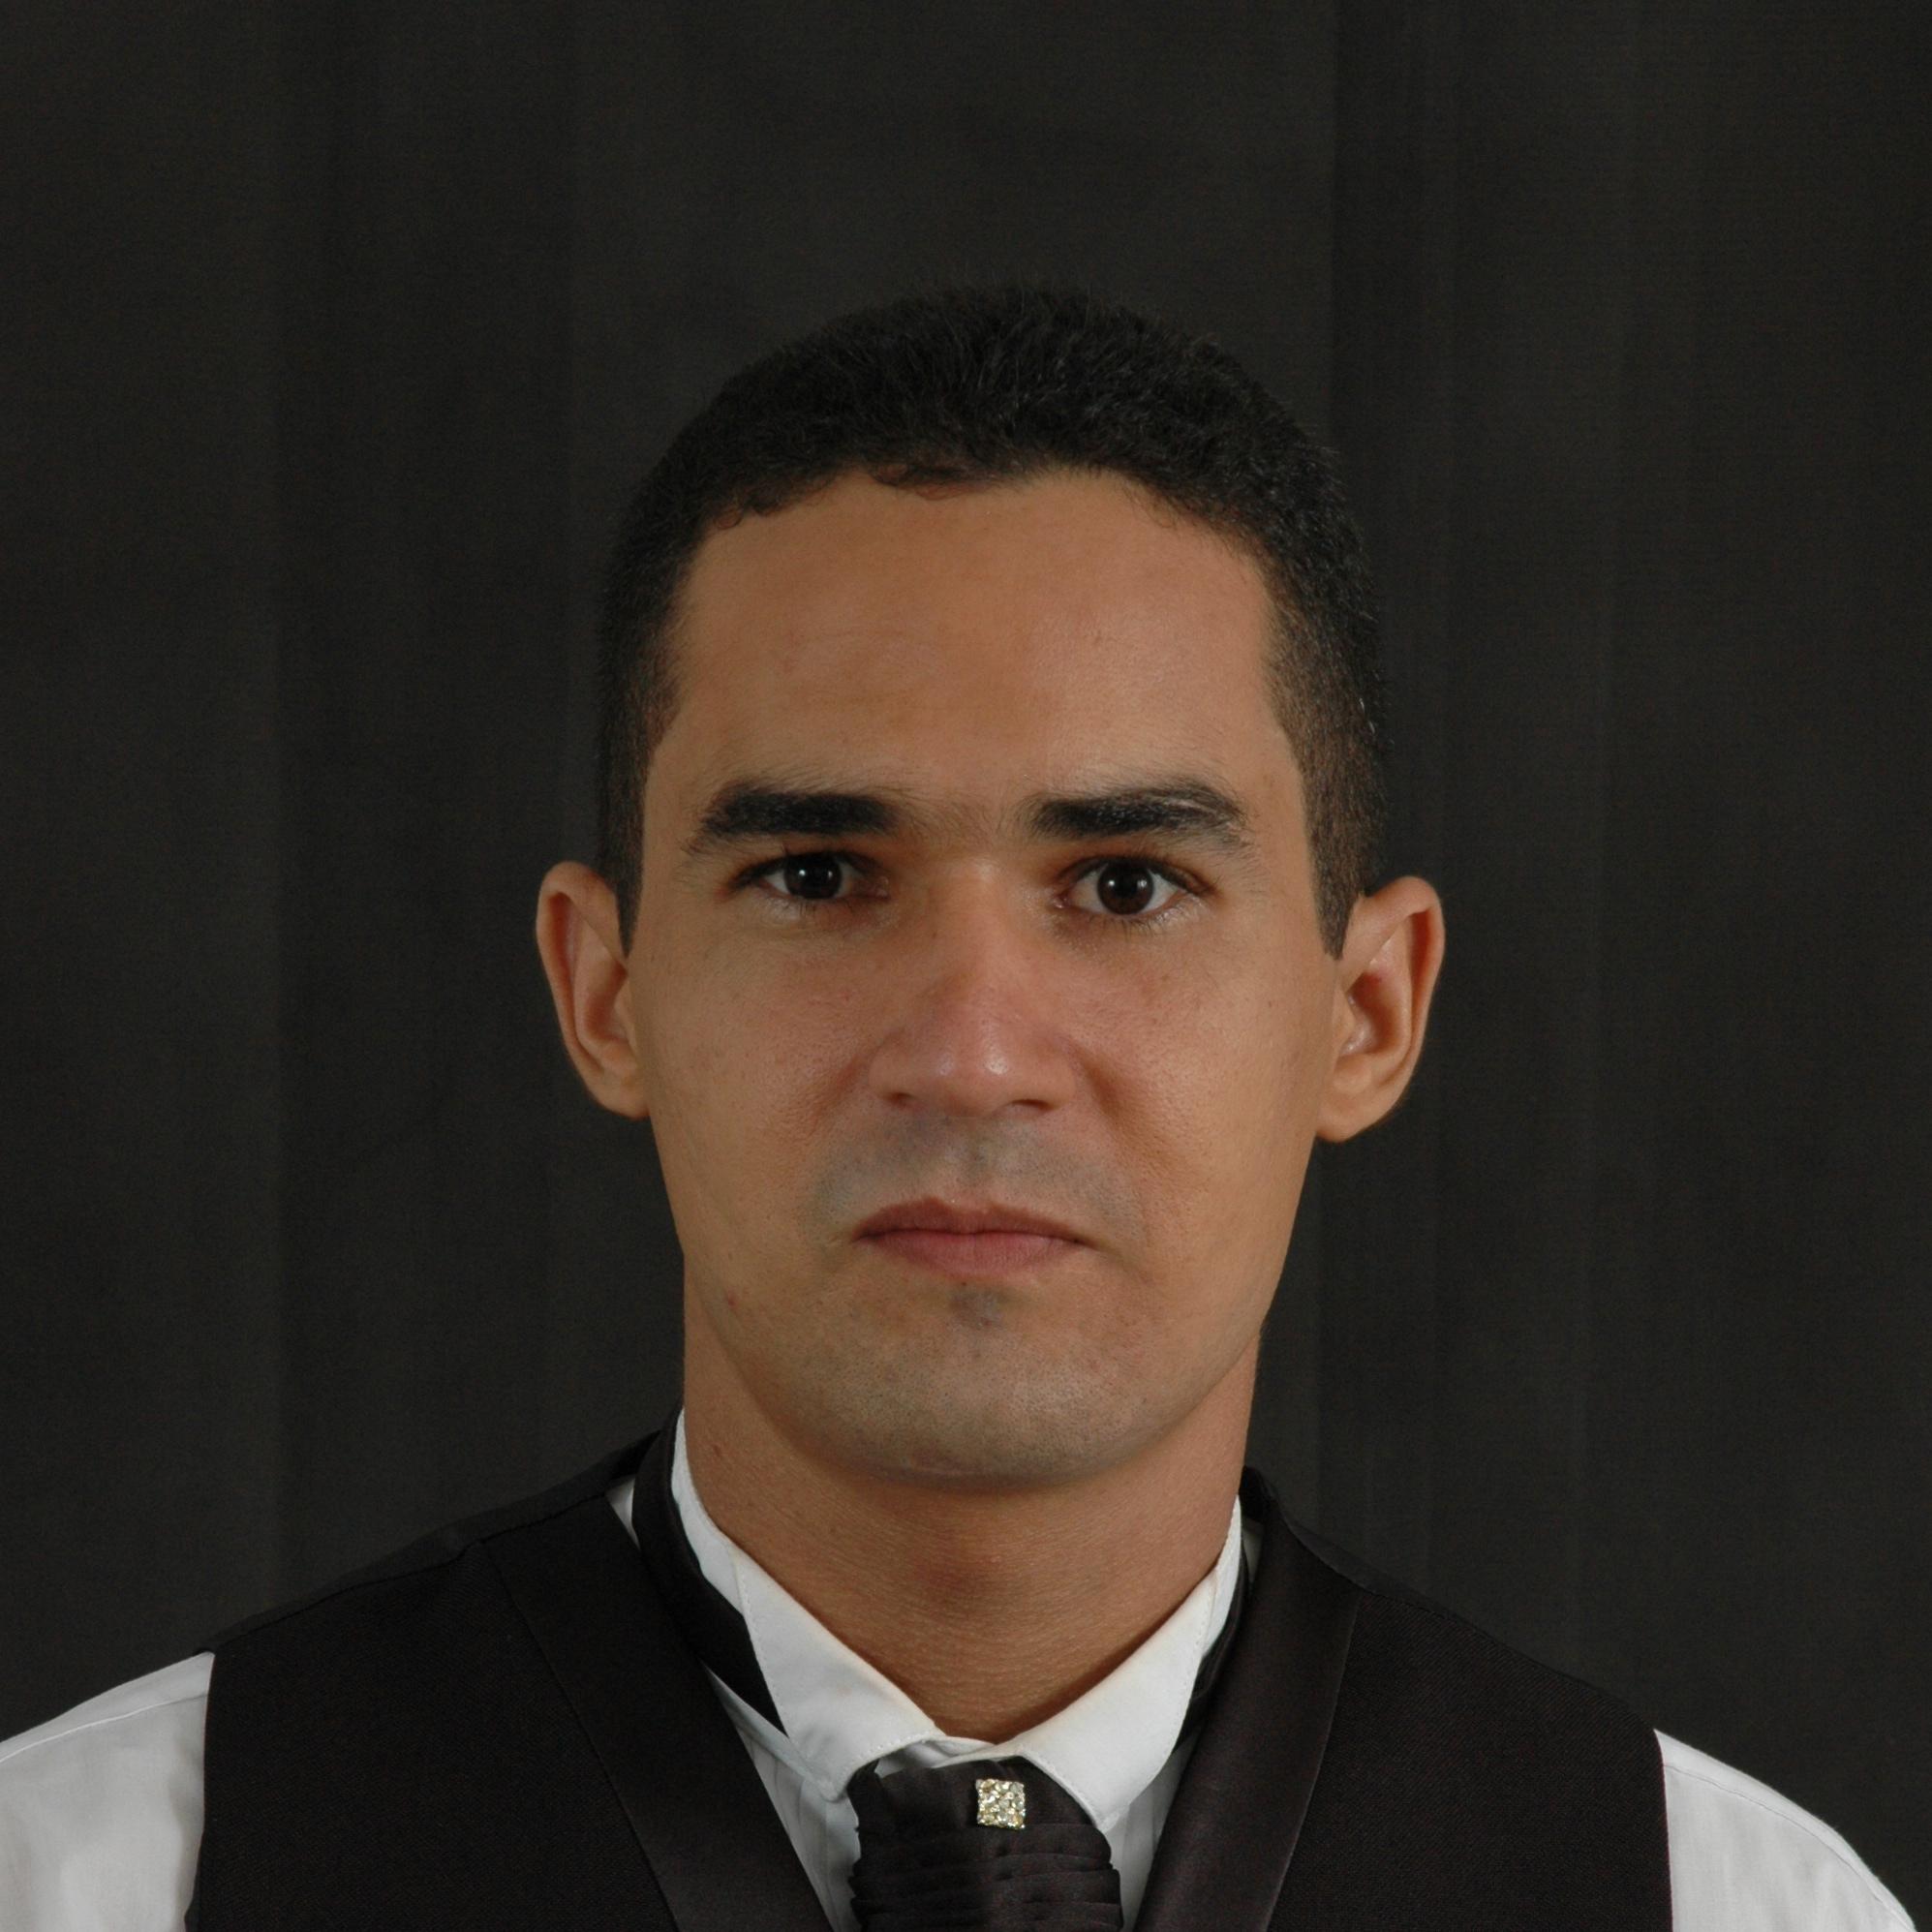 Alexandre Andrade de Souza